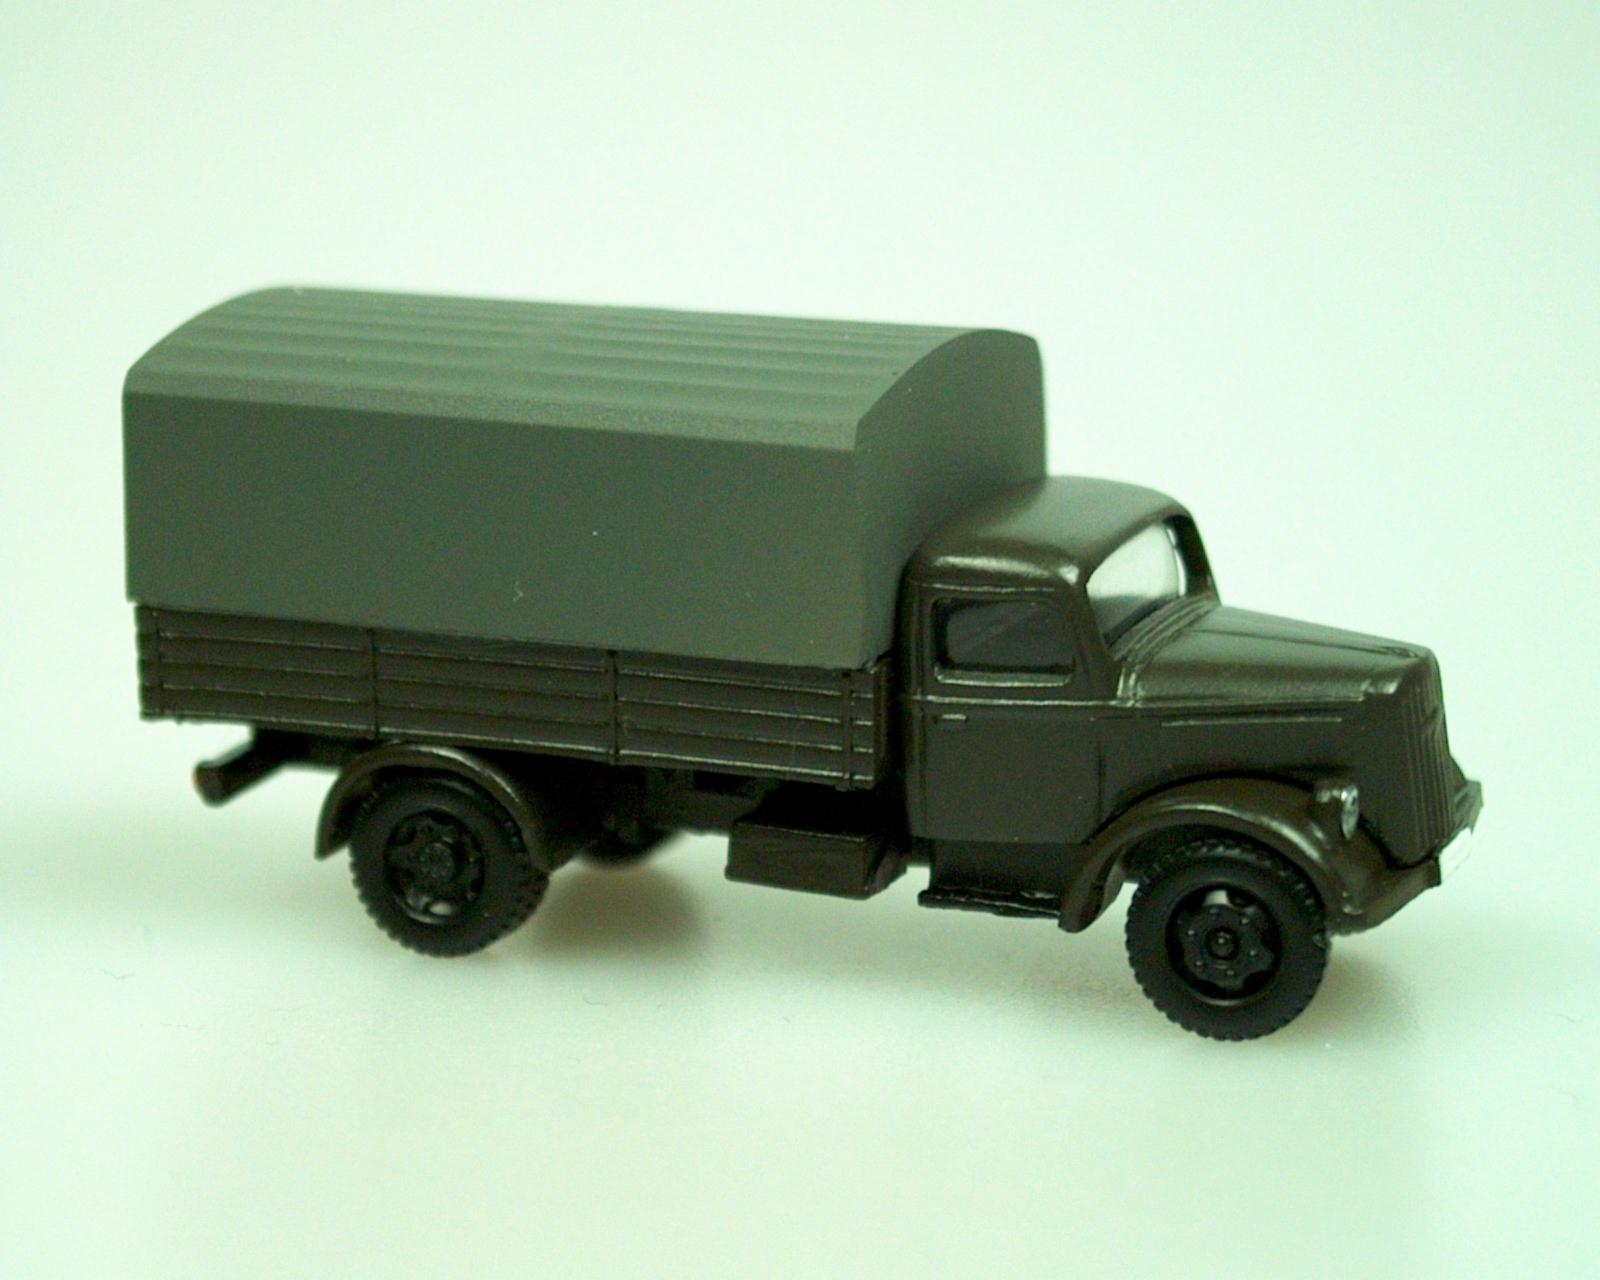 1939 Truck (Military)